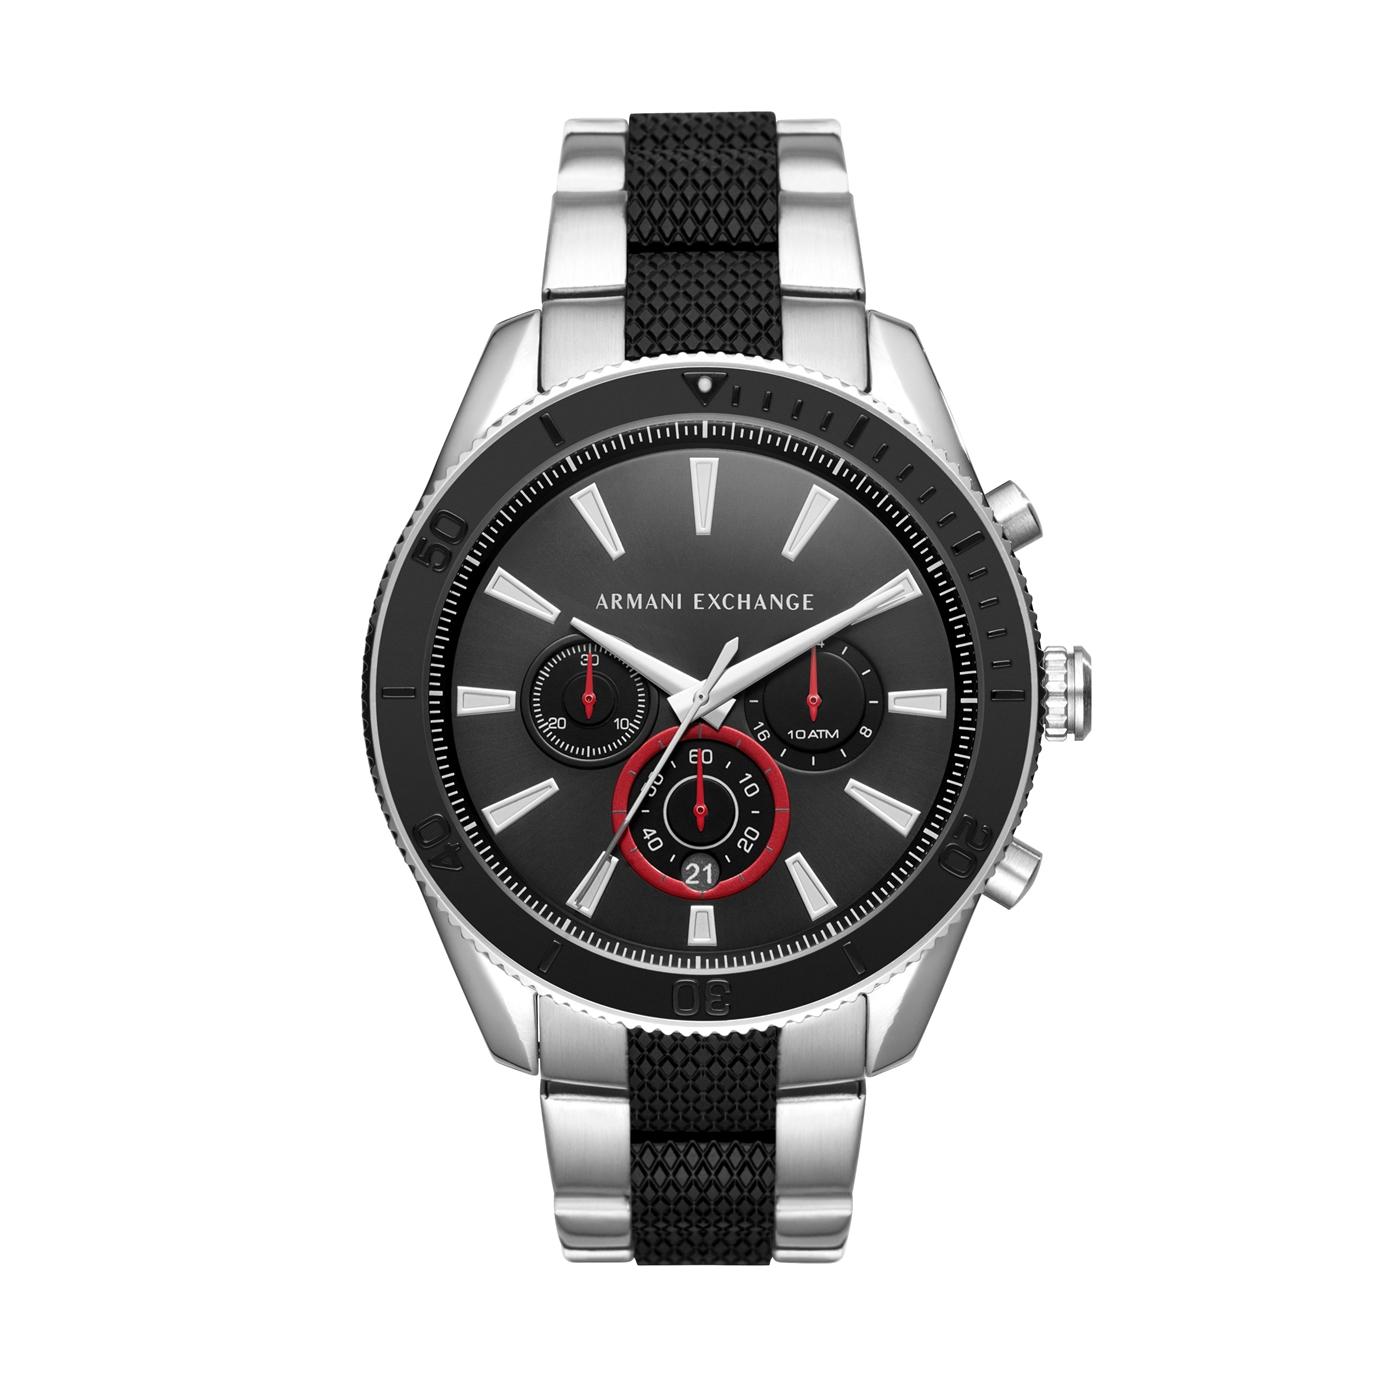 Afbeelding van Armani Exchange Enzo horloge AX1813